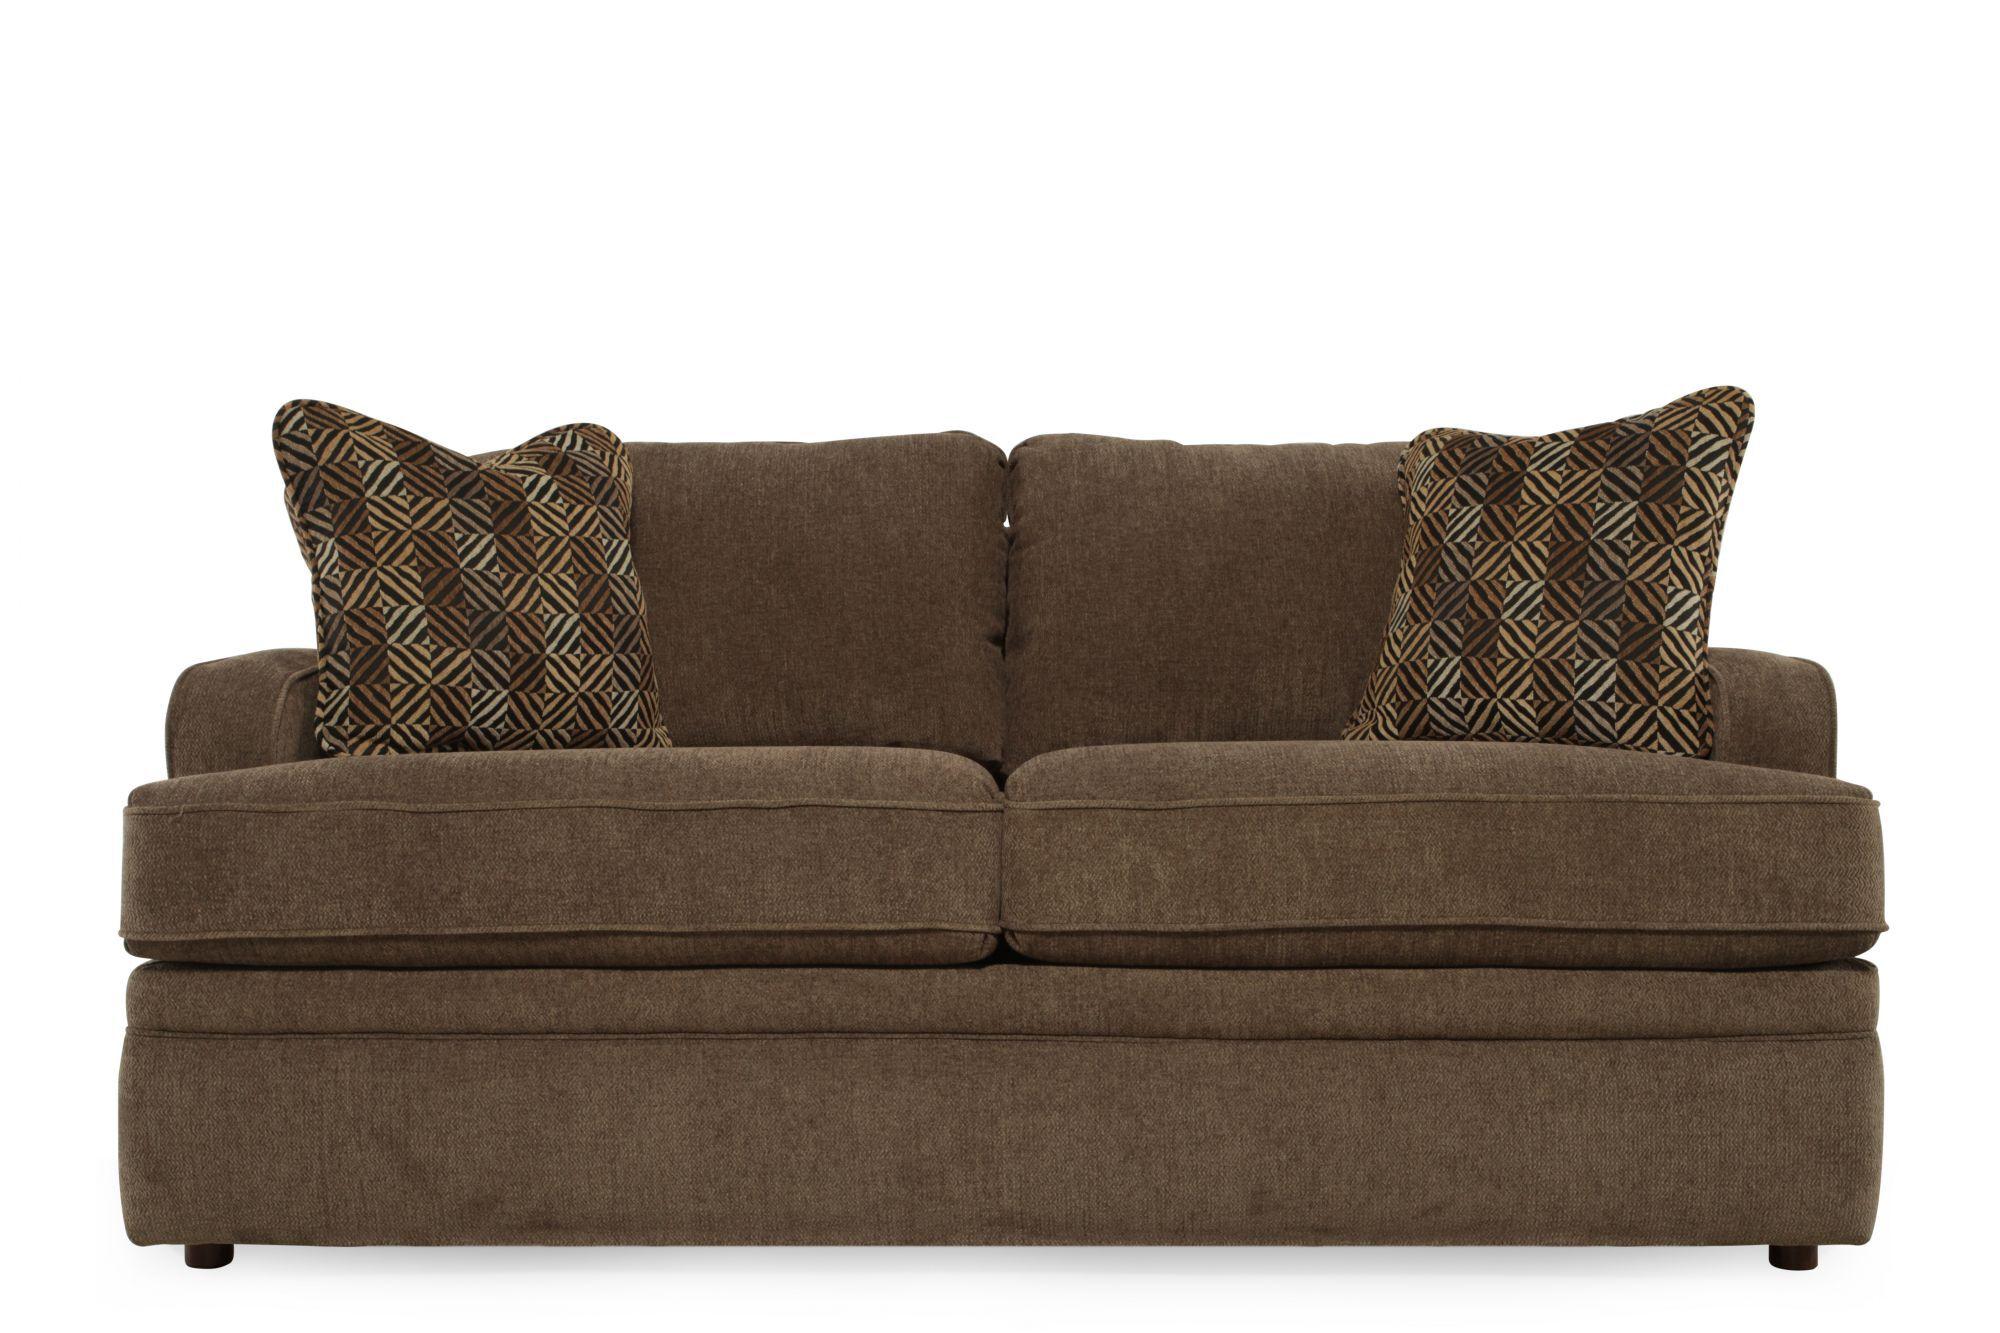 la z boy diana sleeper sofa corner 2 tobacco full mathis brothers